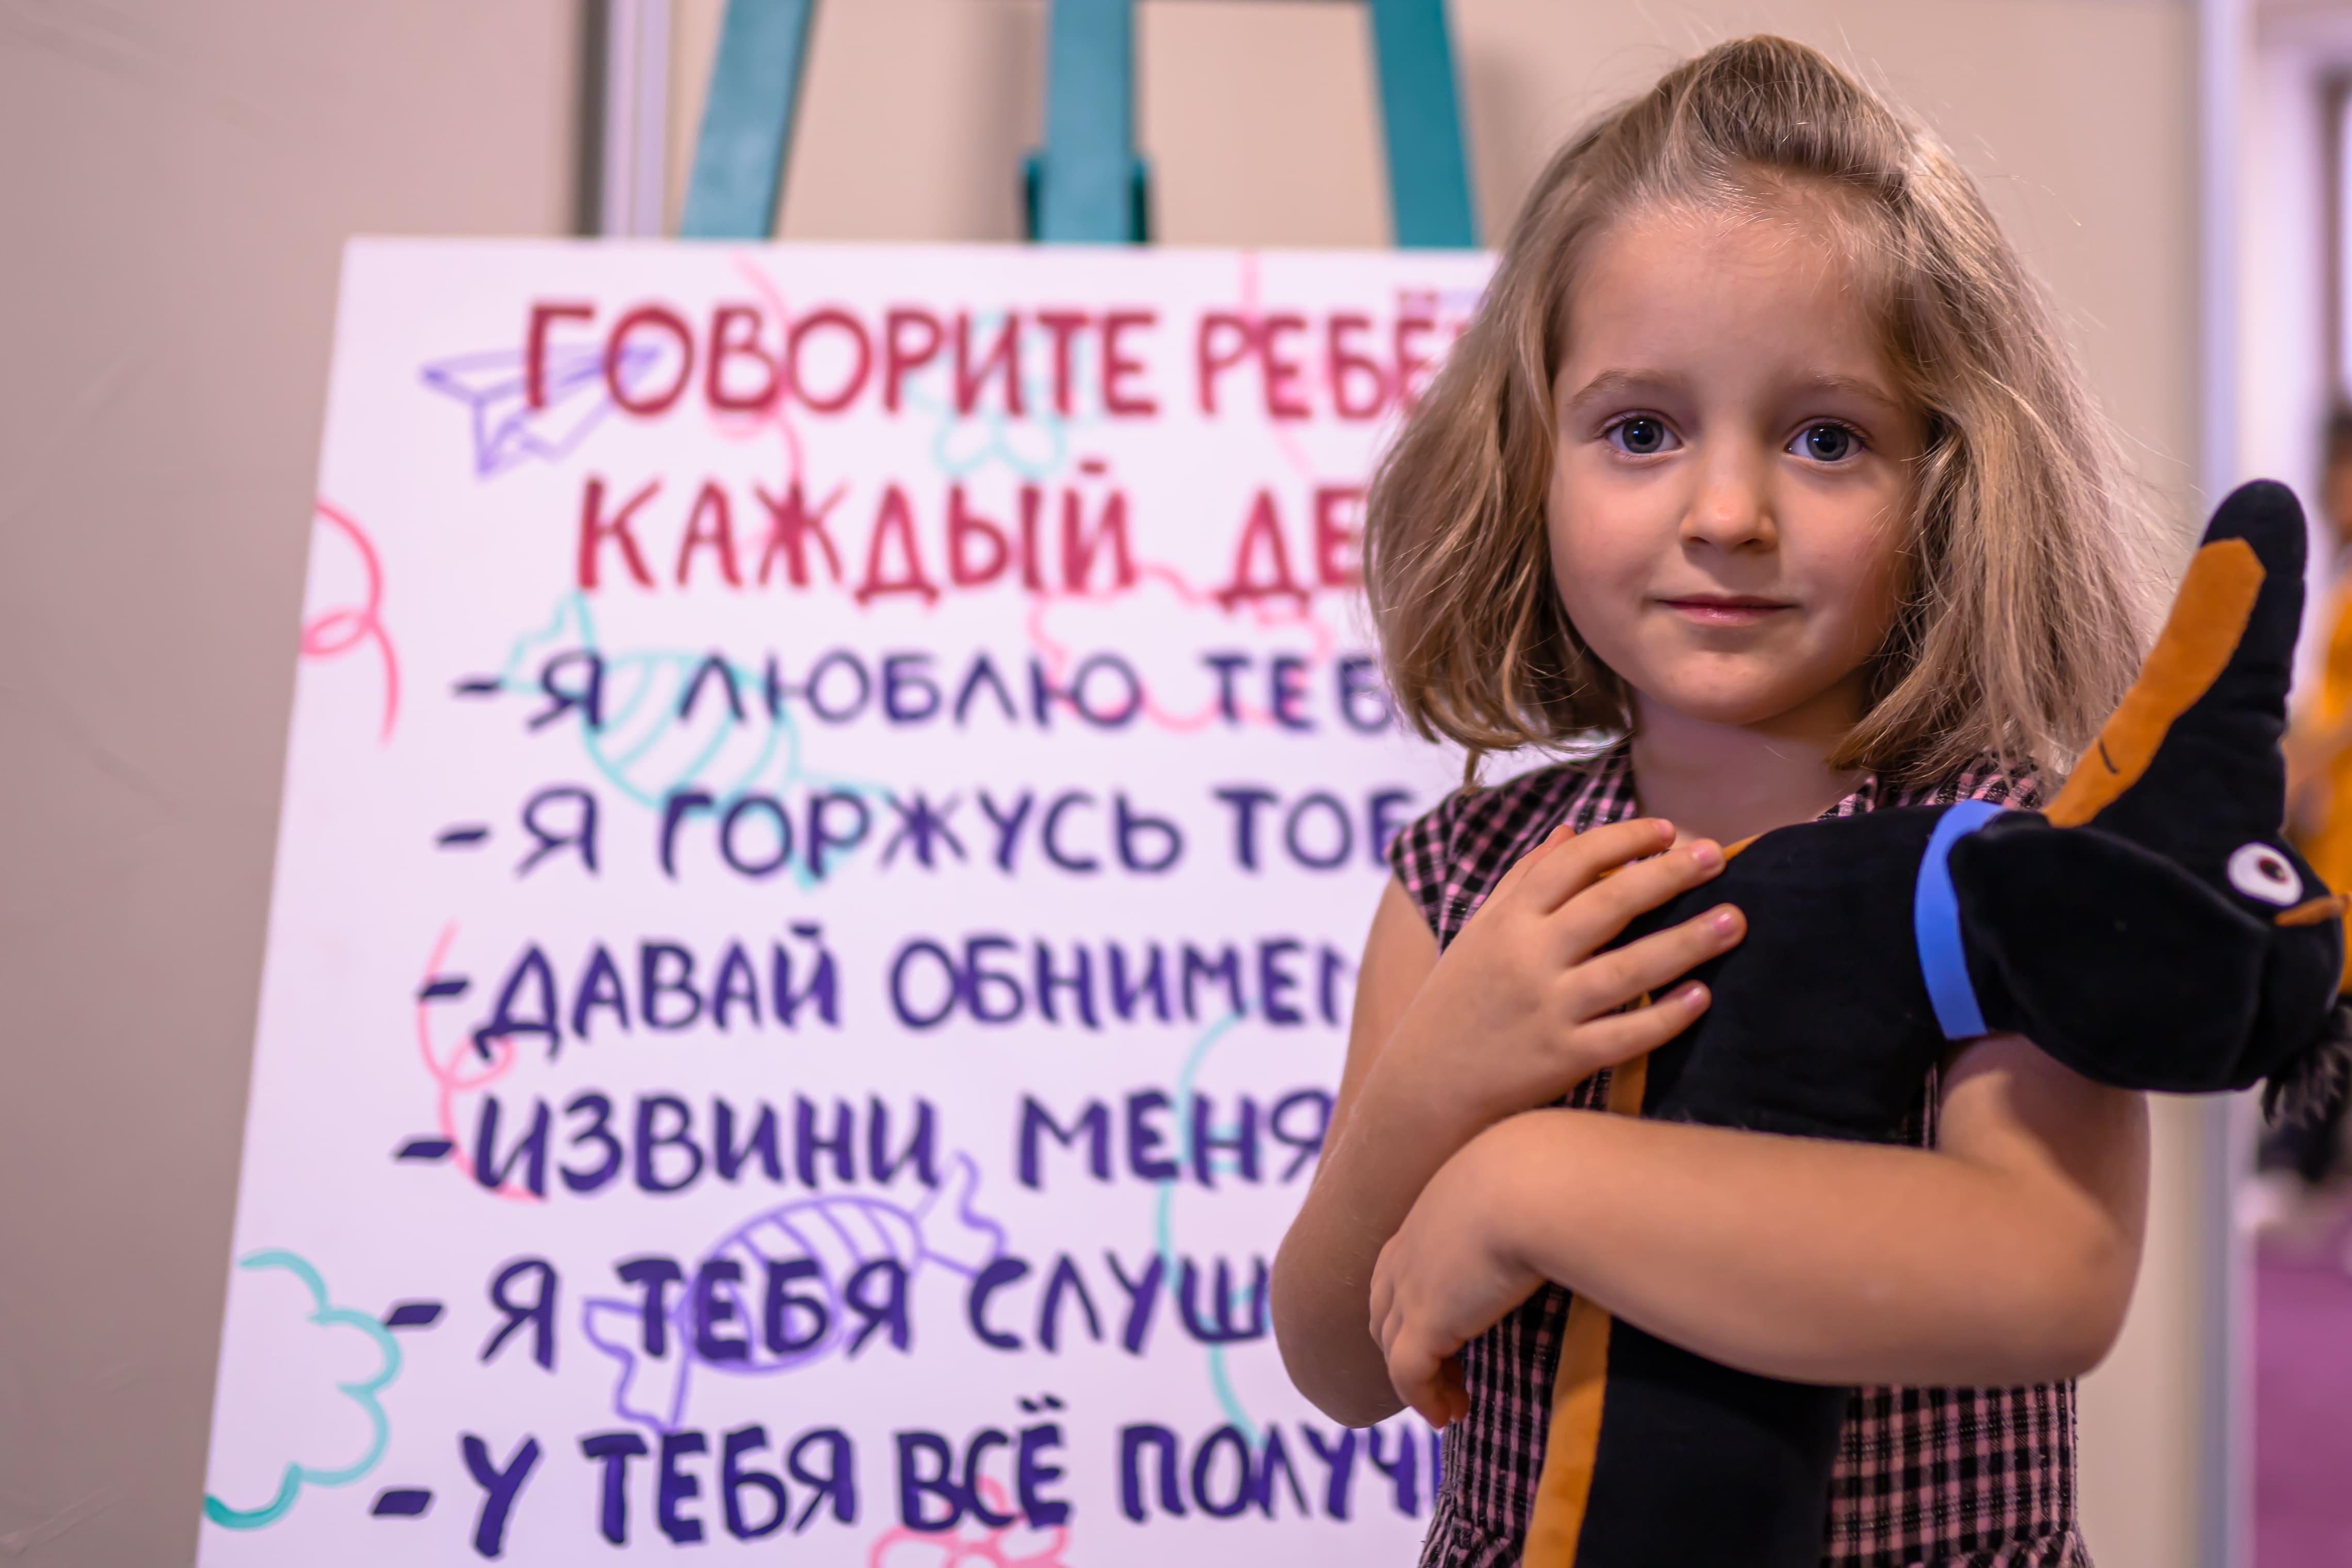 https://akademia-detstva.od.ua/app/uploads/2020/02/nastroenie-.jpg